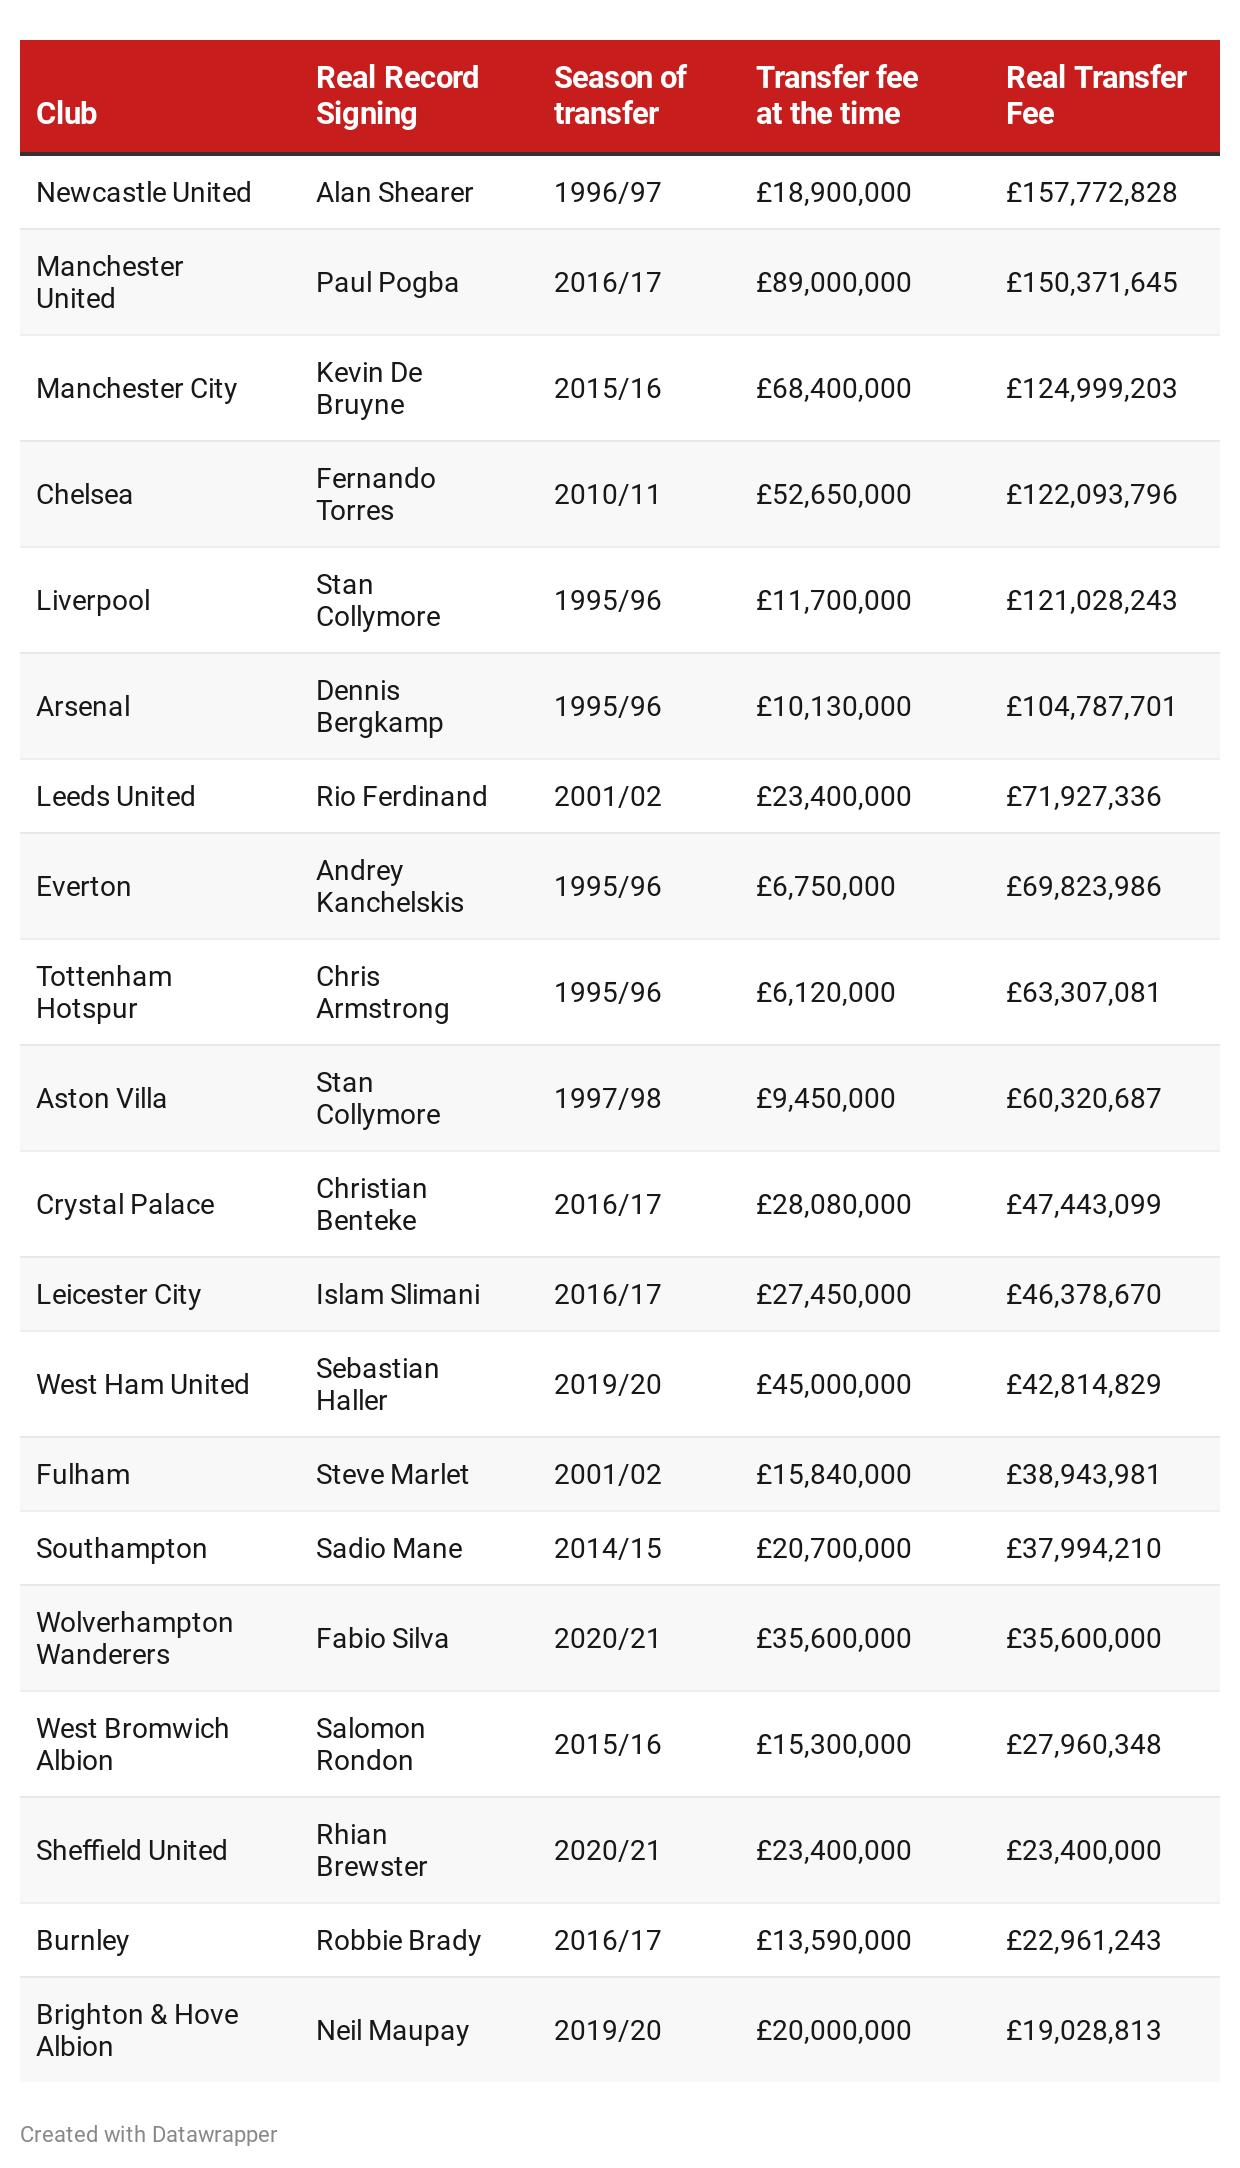 Premier League transfer record